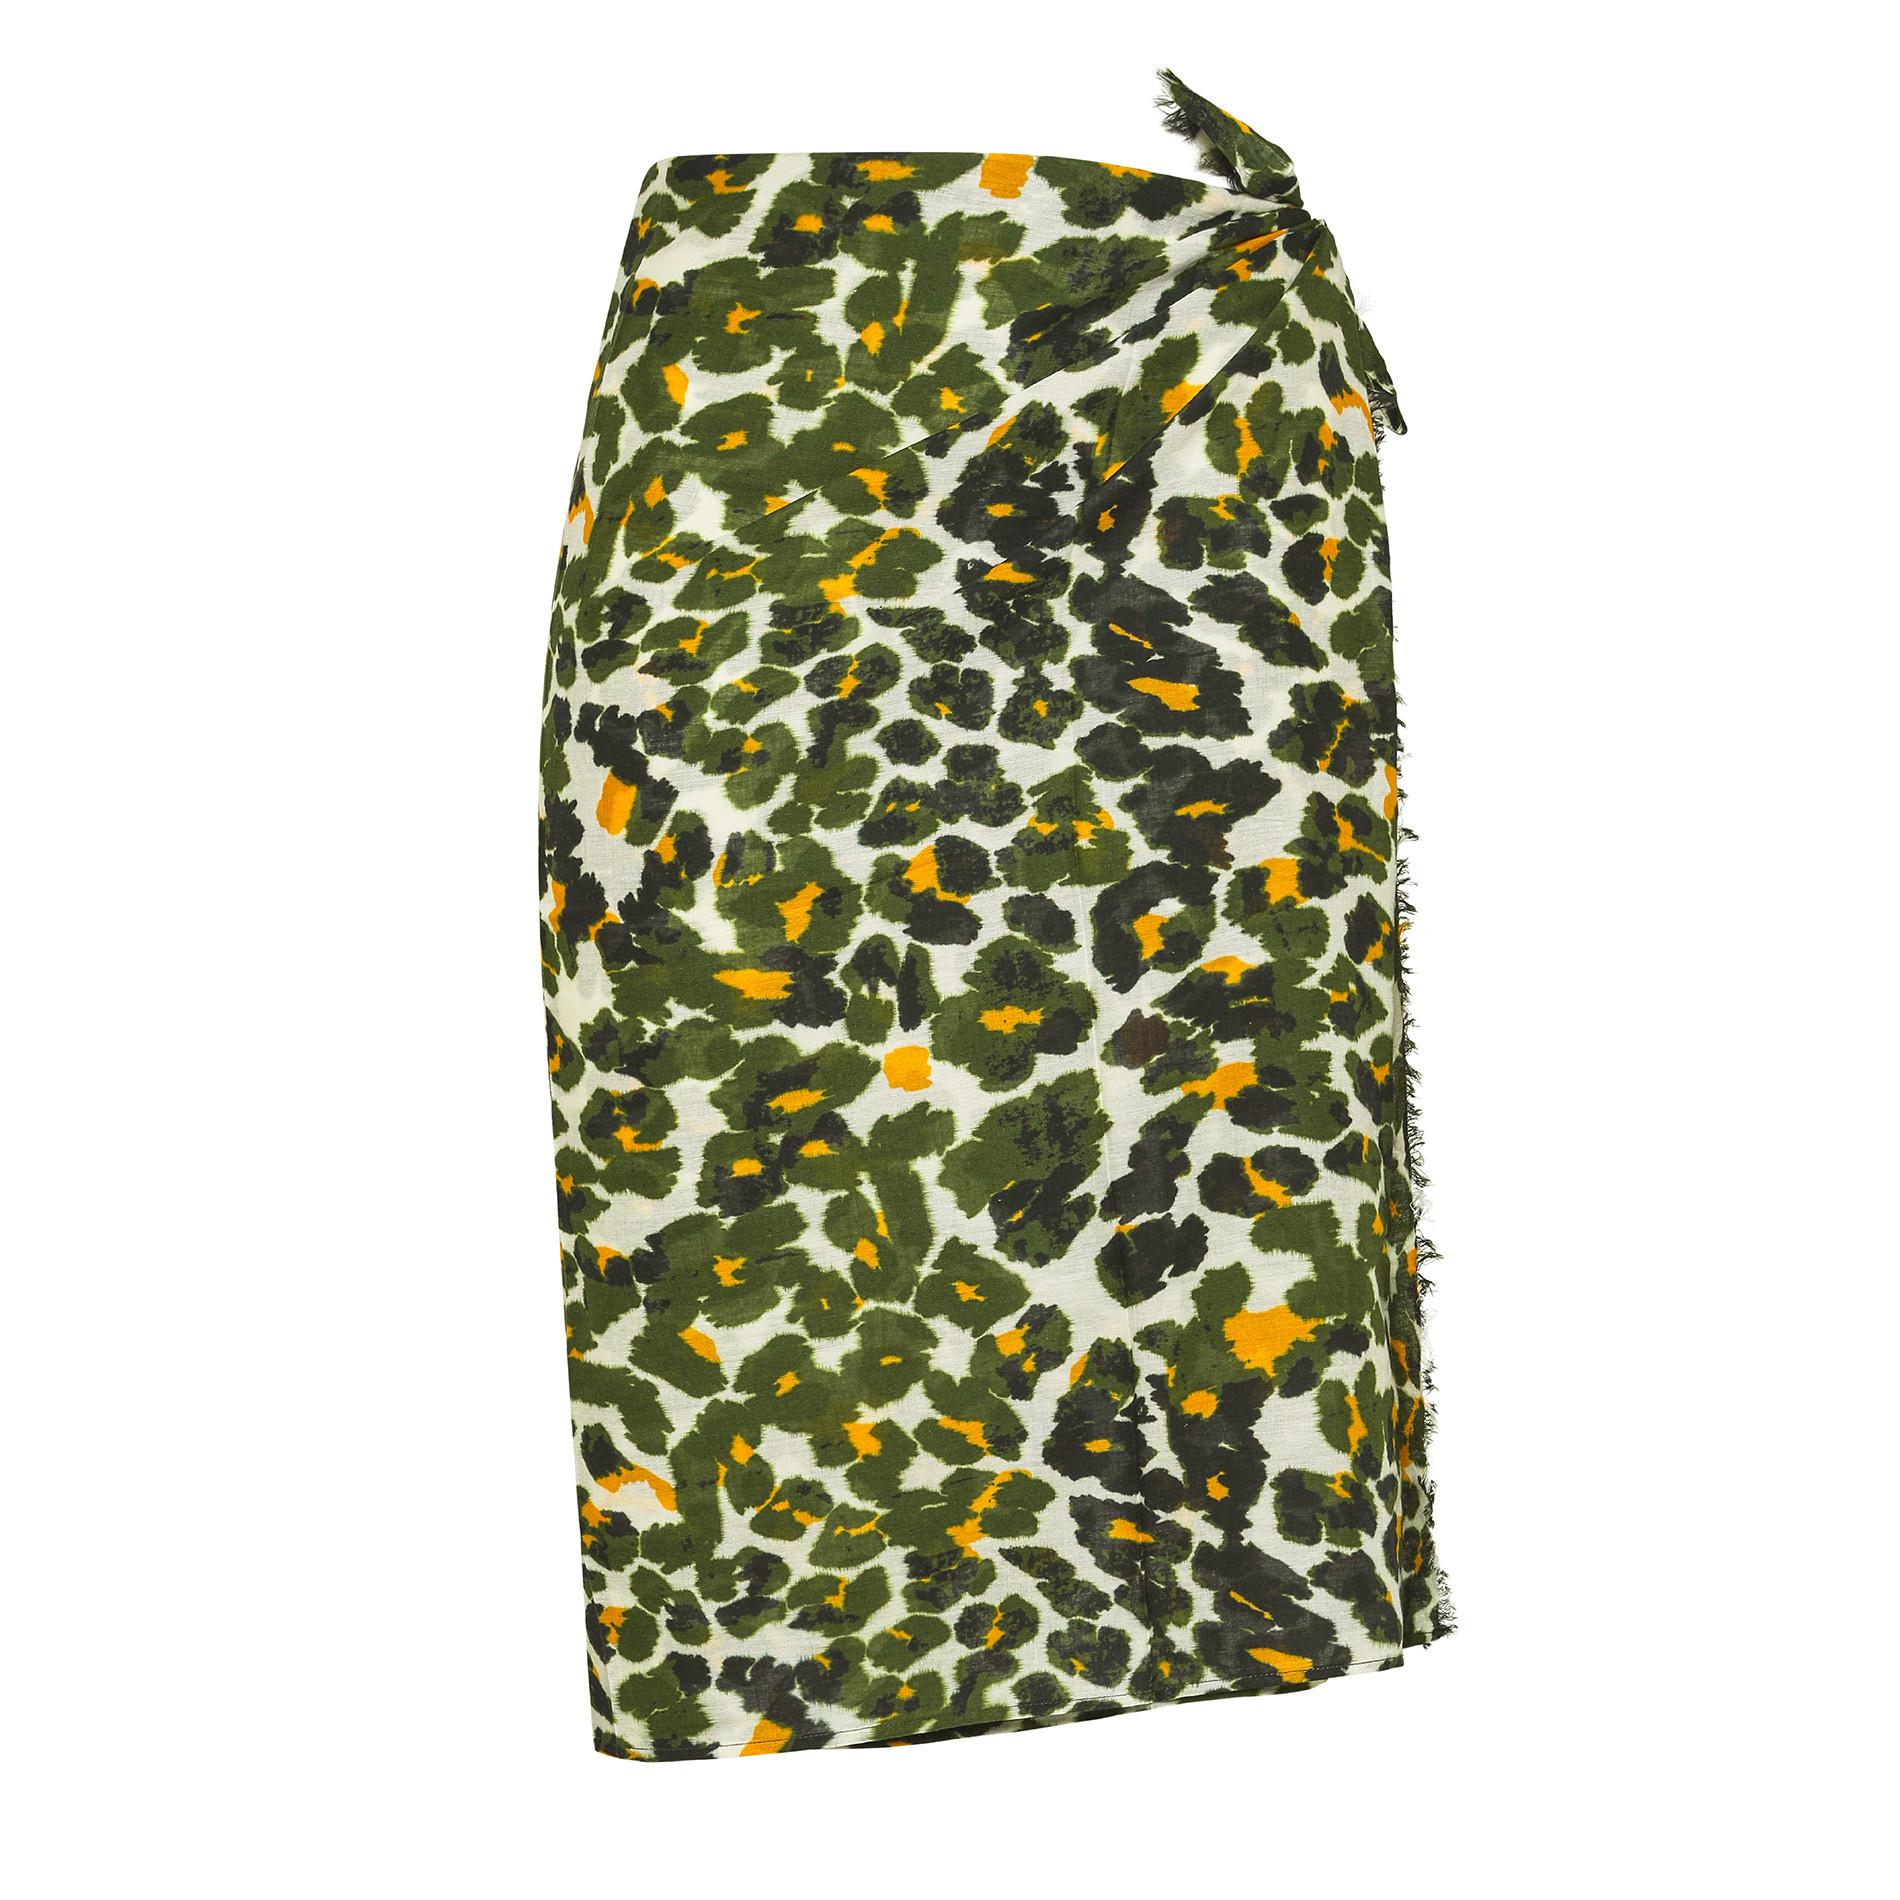 Pareo puro cotone stampa animalier Koan, Verde scuro, large image number 0